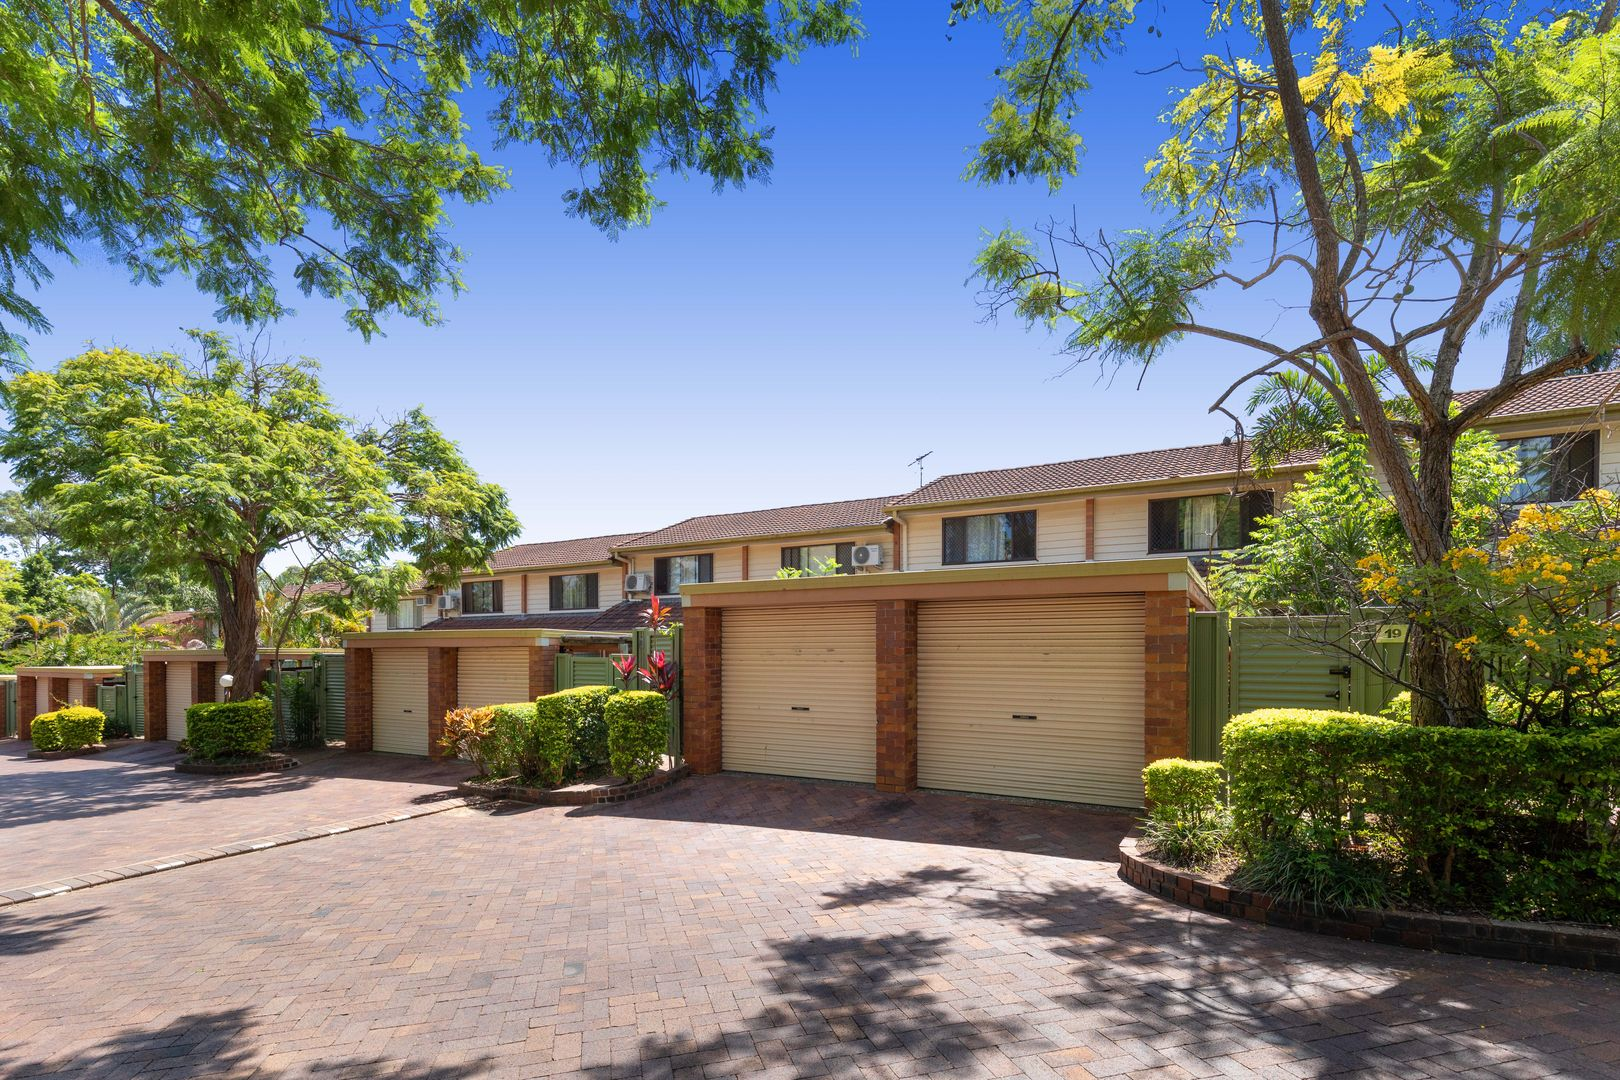 19/123 Barbaralla Drive, Springwood QLD 4127, Image 0